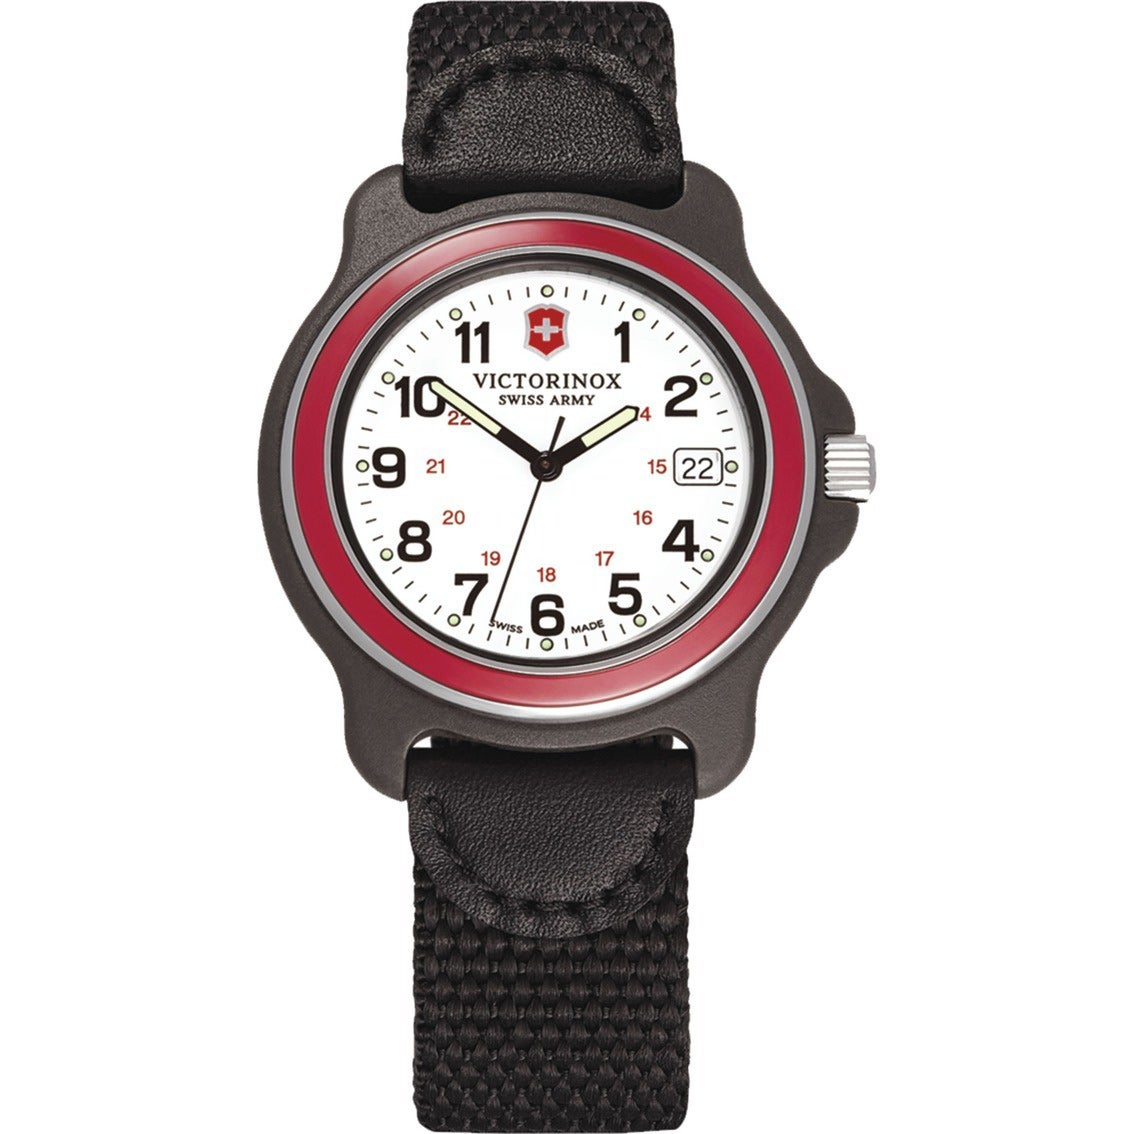 Victorinox Swiss Army Original 249088 Men's Red Bazel Bla...